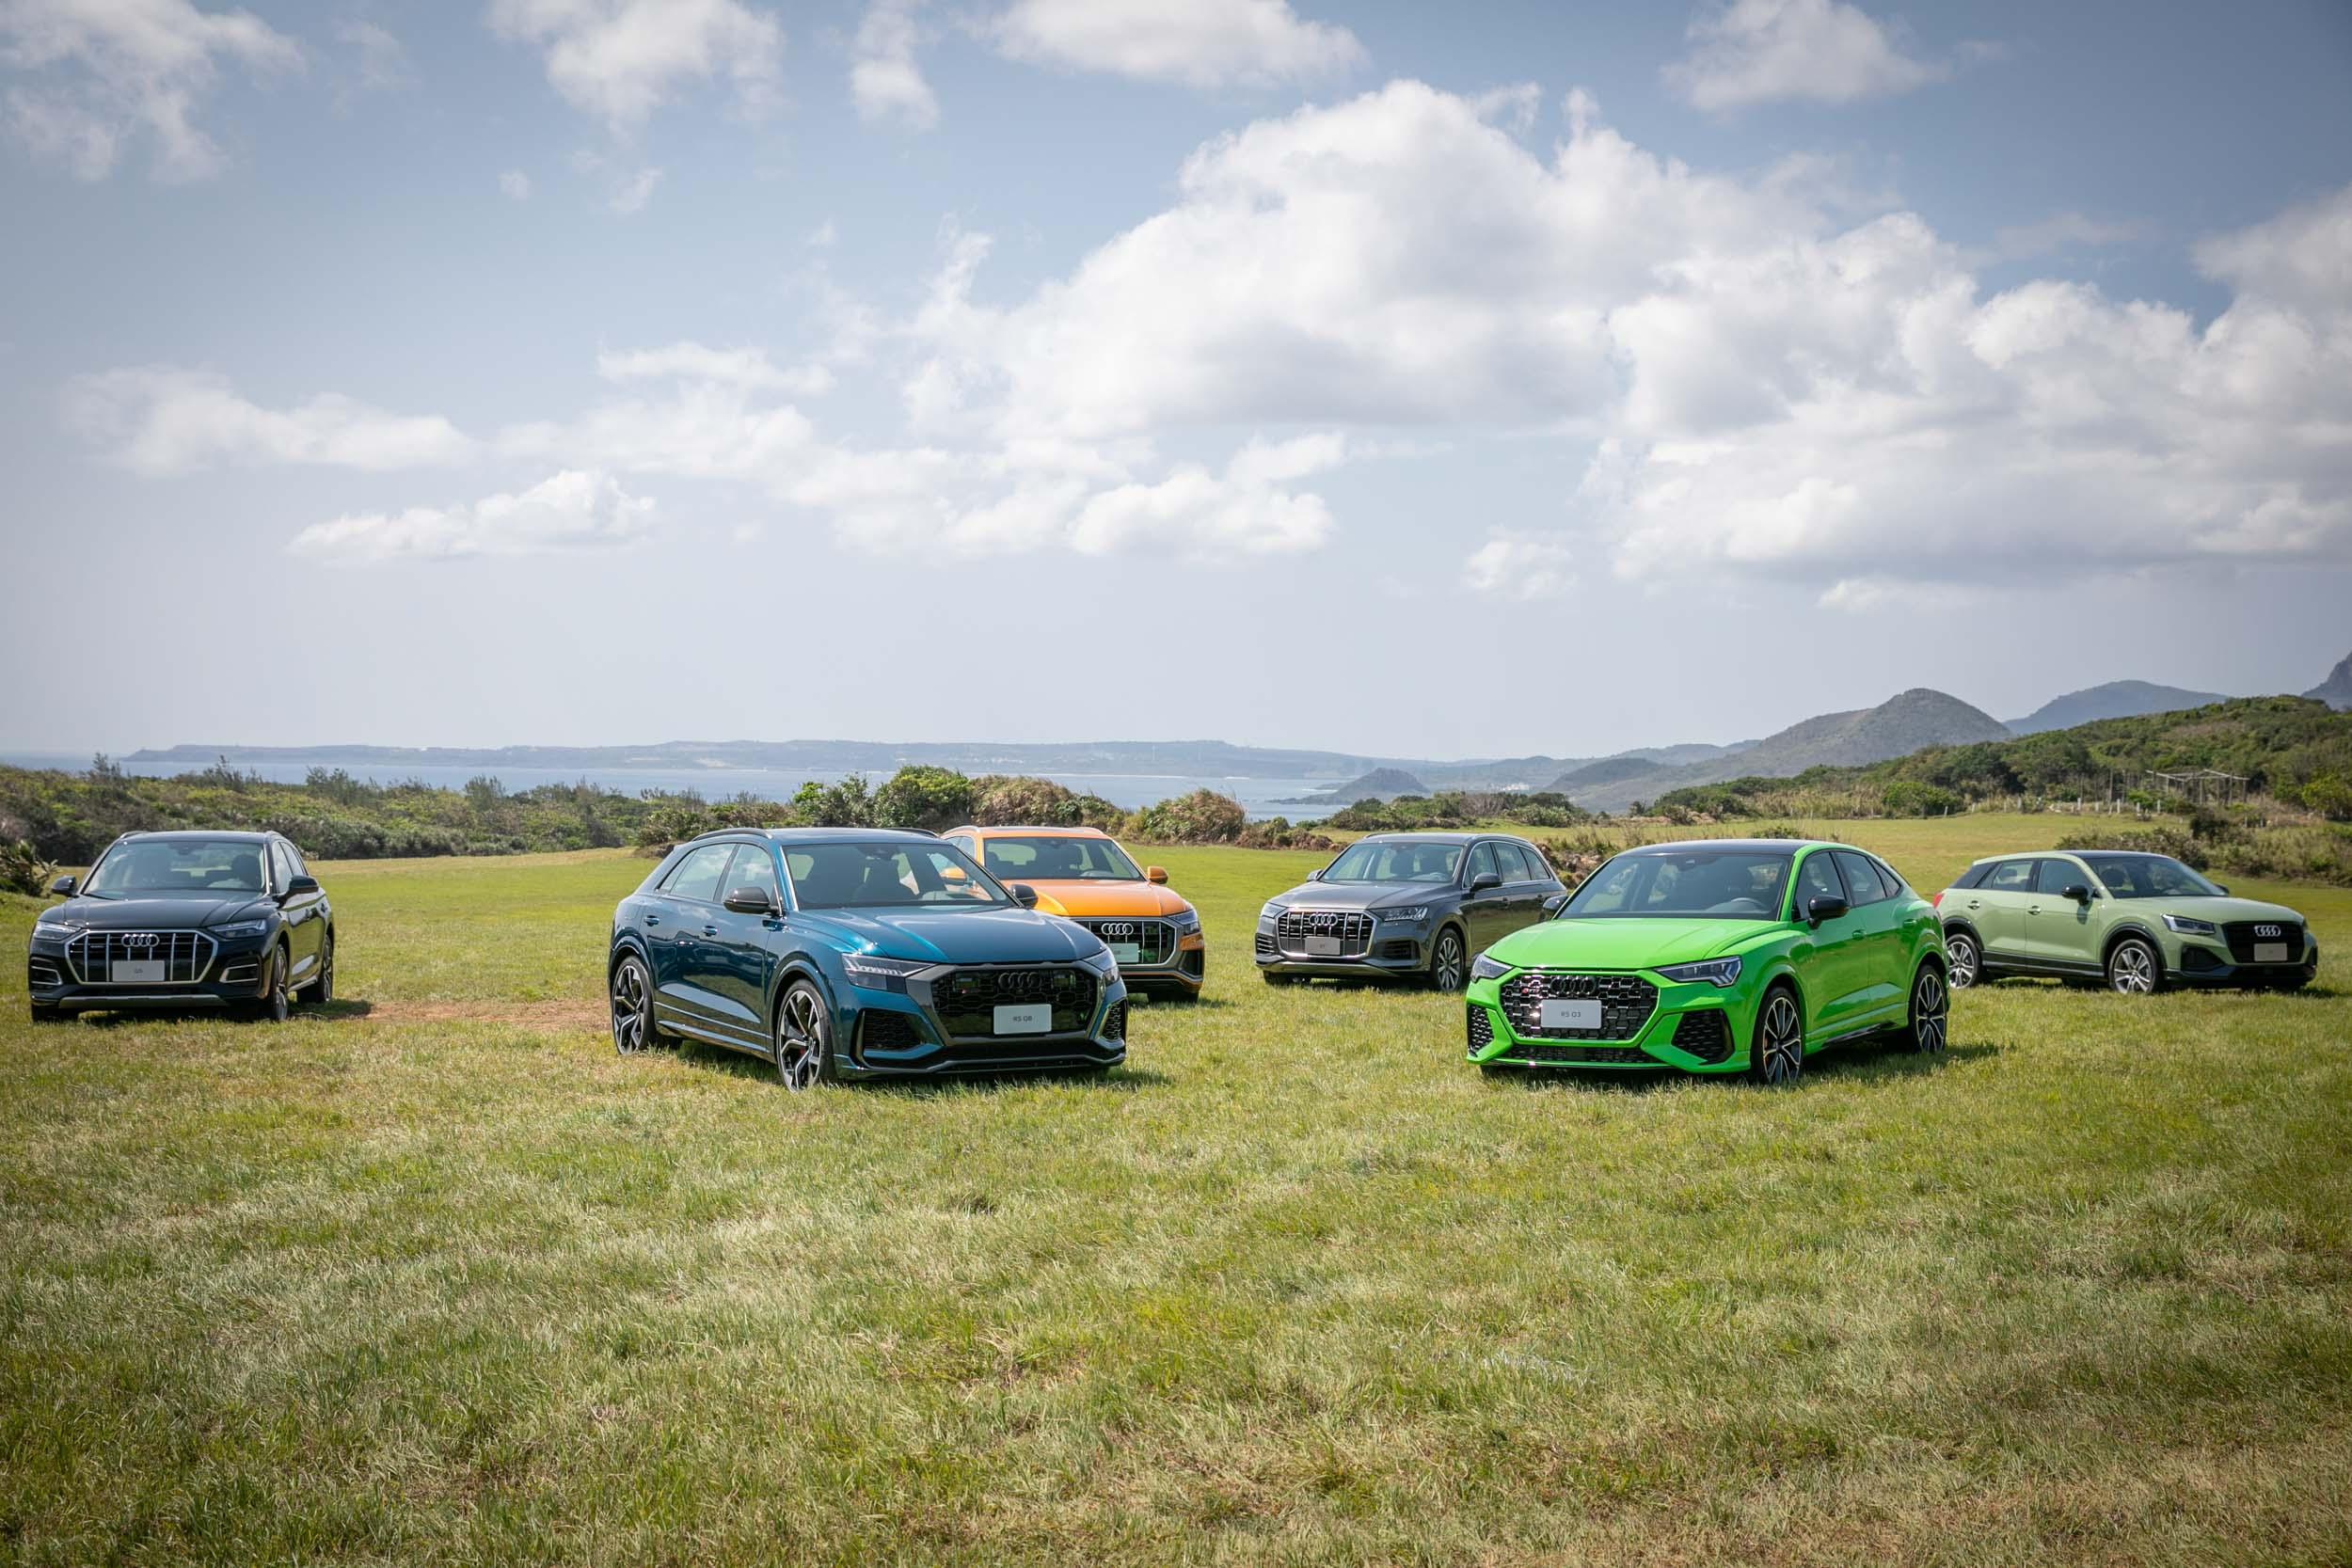 Audi 新世代休旅大軍 Q 家族正式成軍,提供消費者更多元選擇。